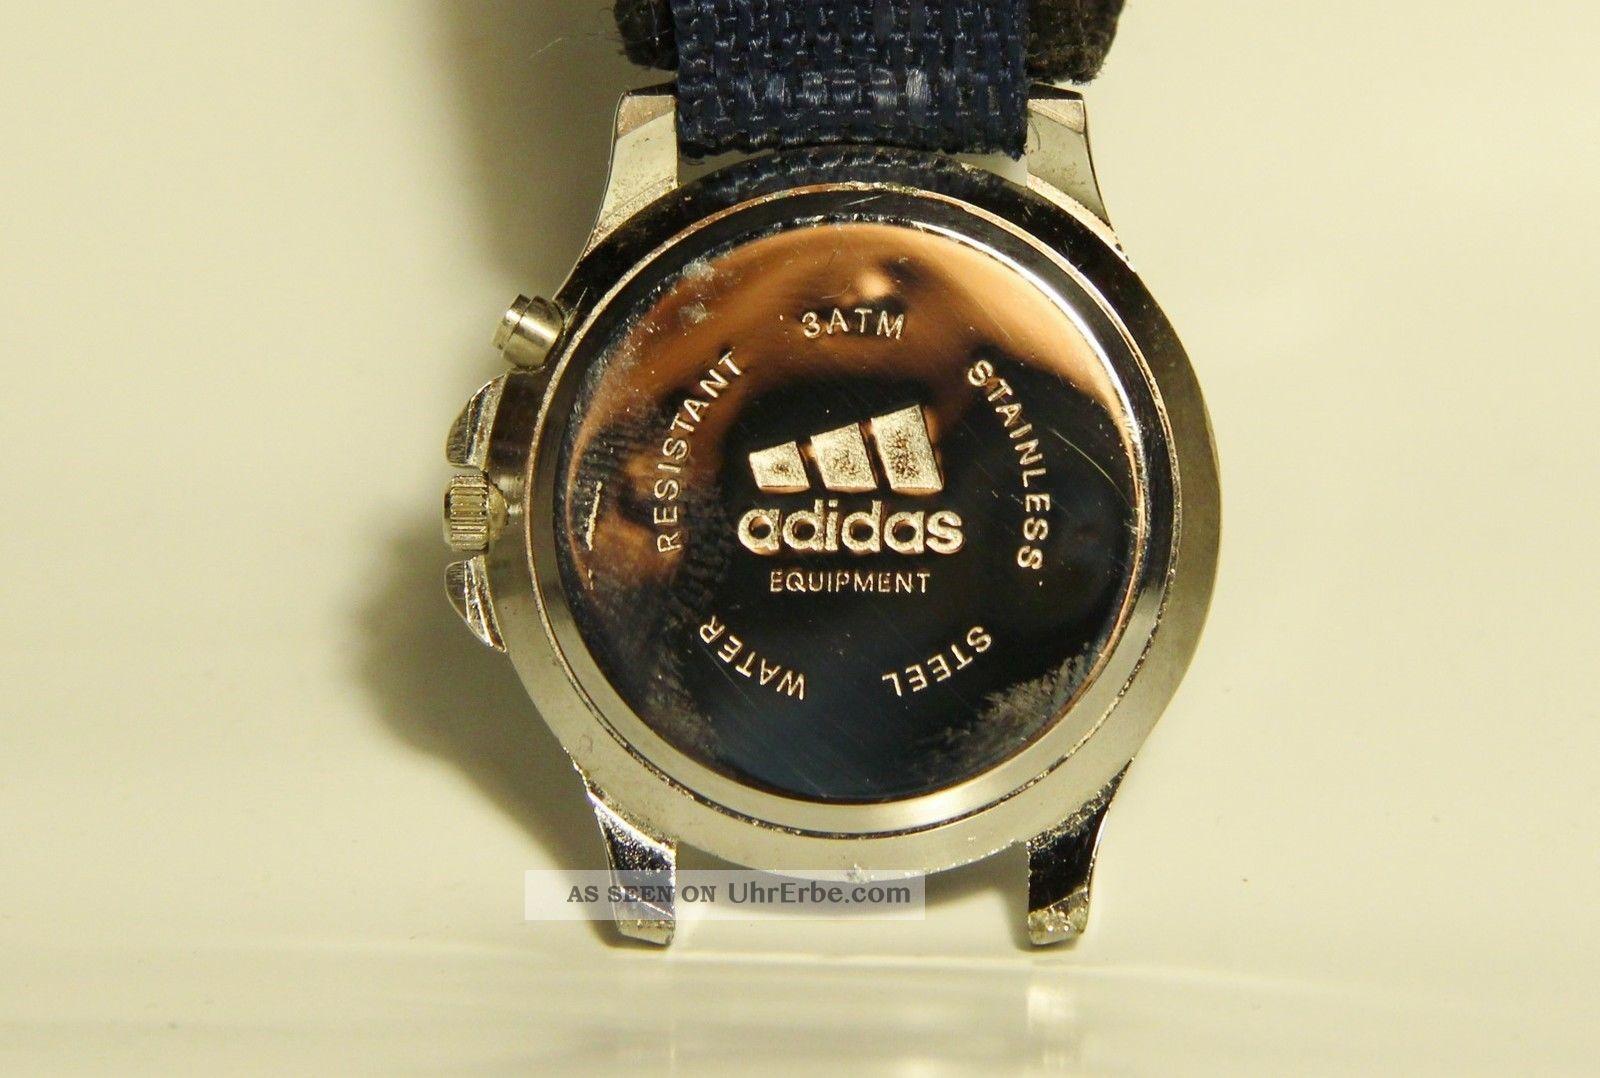 Adidas Herren (oder Damen) Sport Armbanduhr Mit Nachtbeleuchtung Armbanduhren Bild